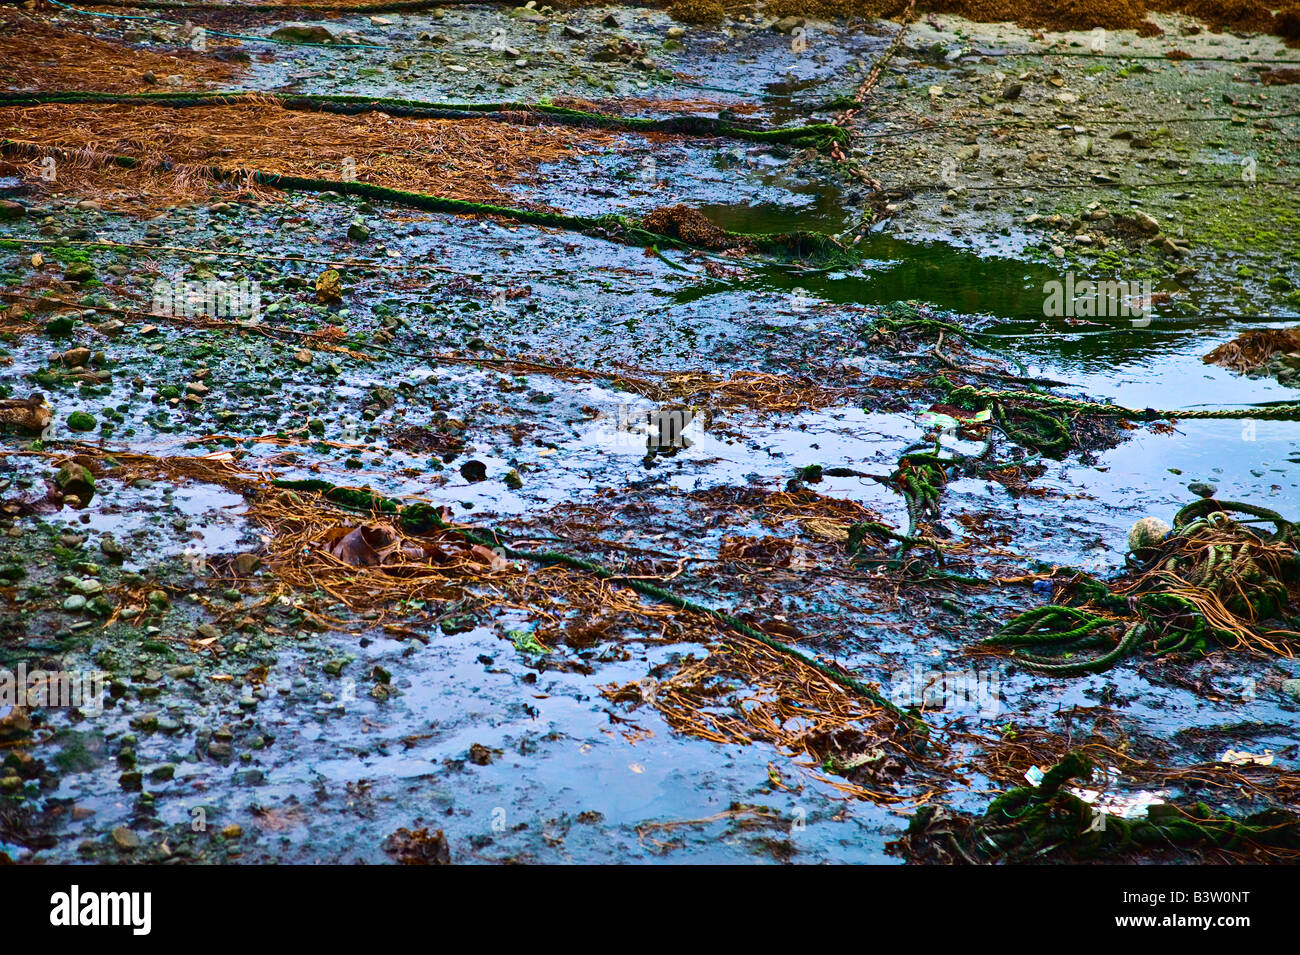 bei Ebbe Landschaft Meeresboden Ile de Ouessant Brittany France Stockbild